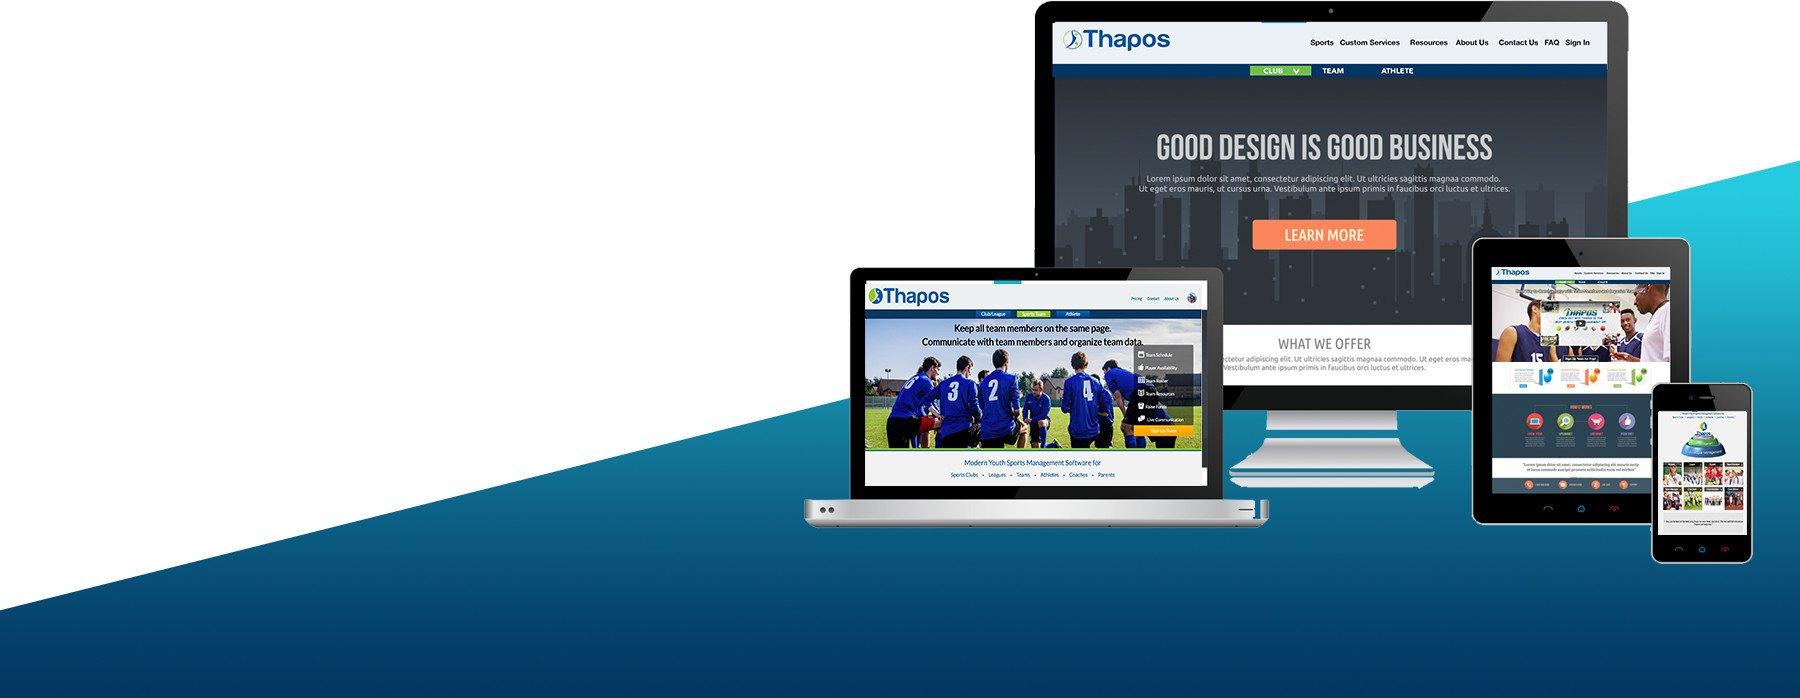 sports team management app